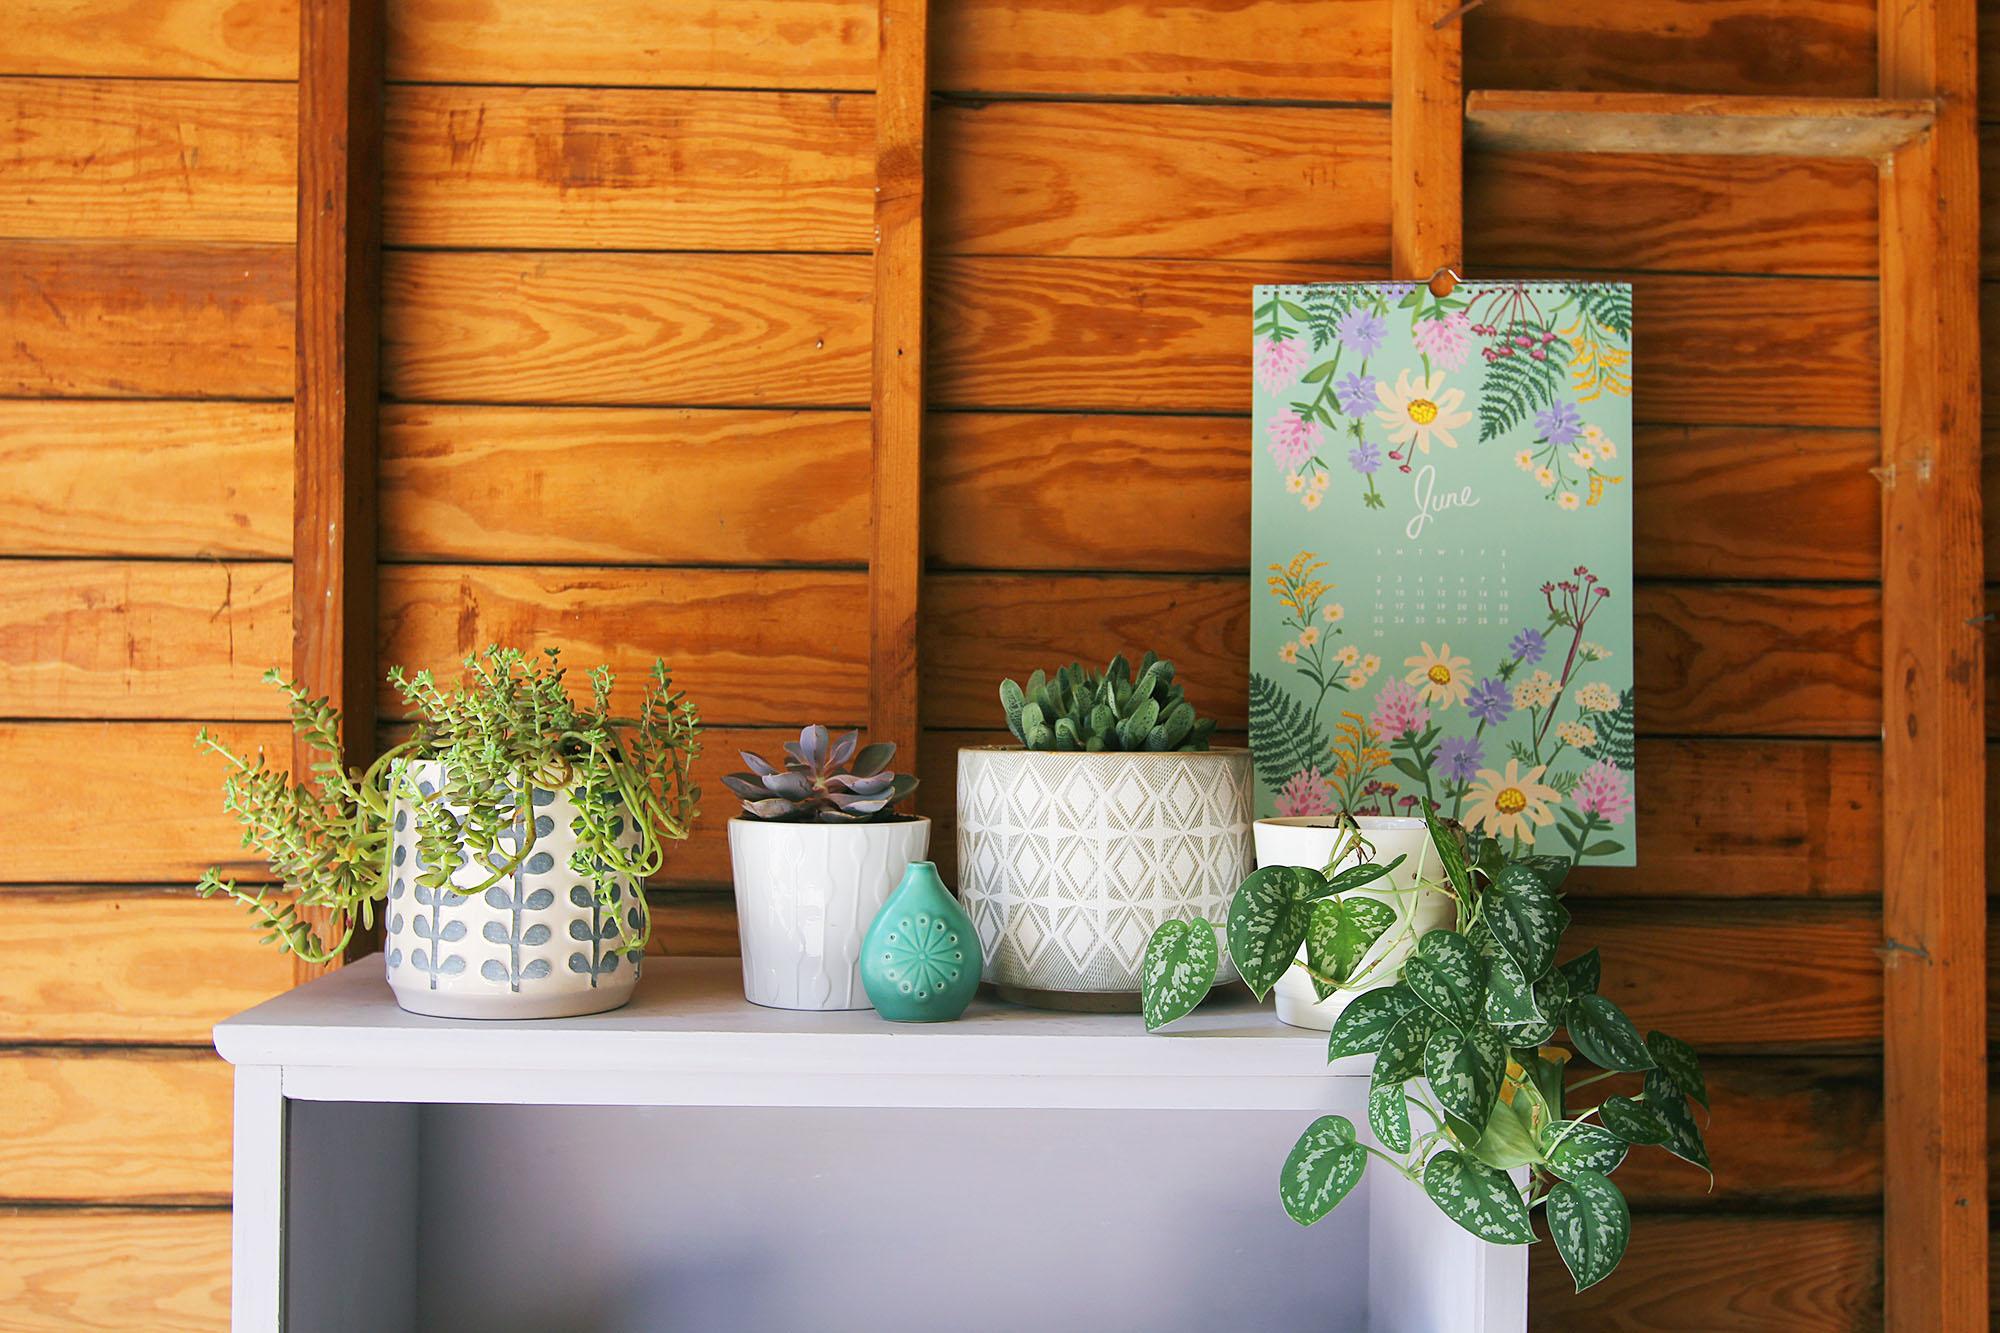 a-simpler-design-annie-sloan-dallas-furniture-lilac-bookcasejpg7.jpg